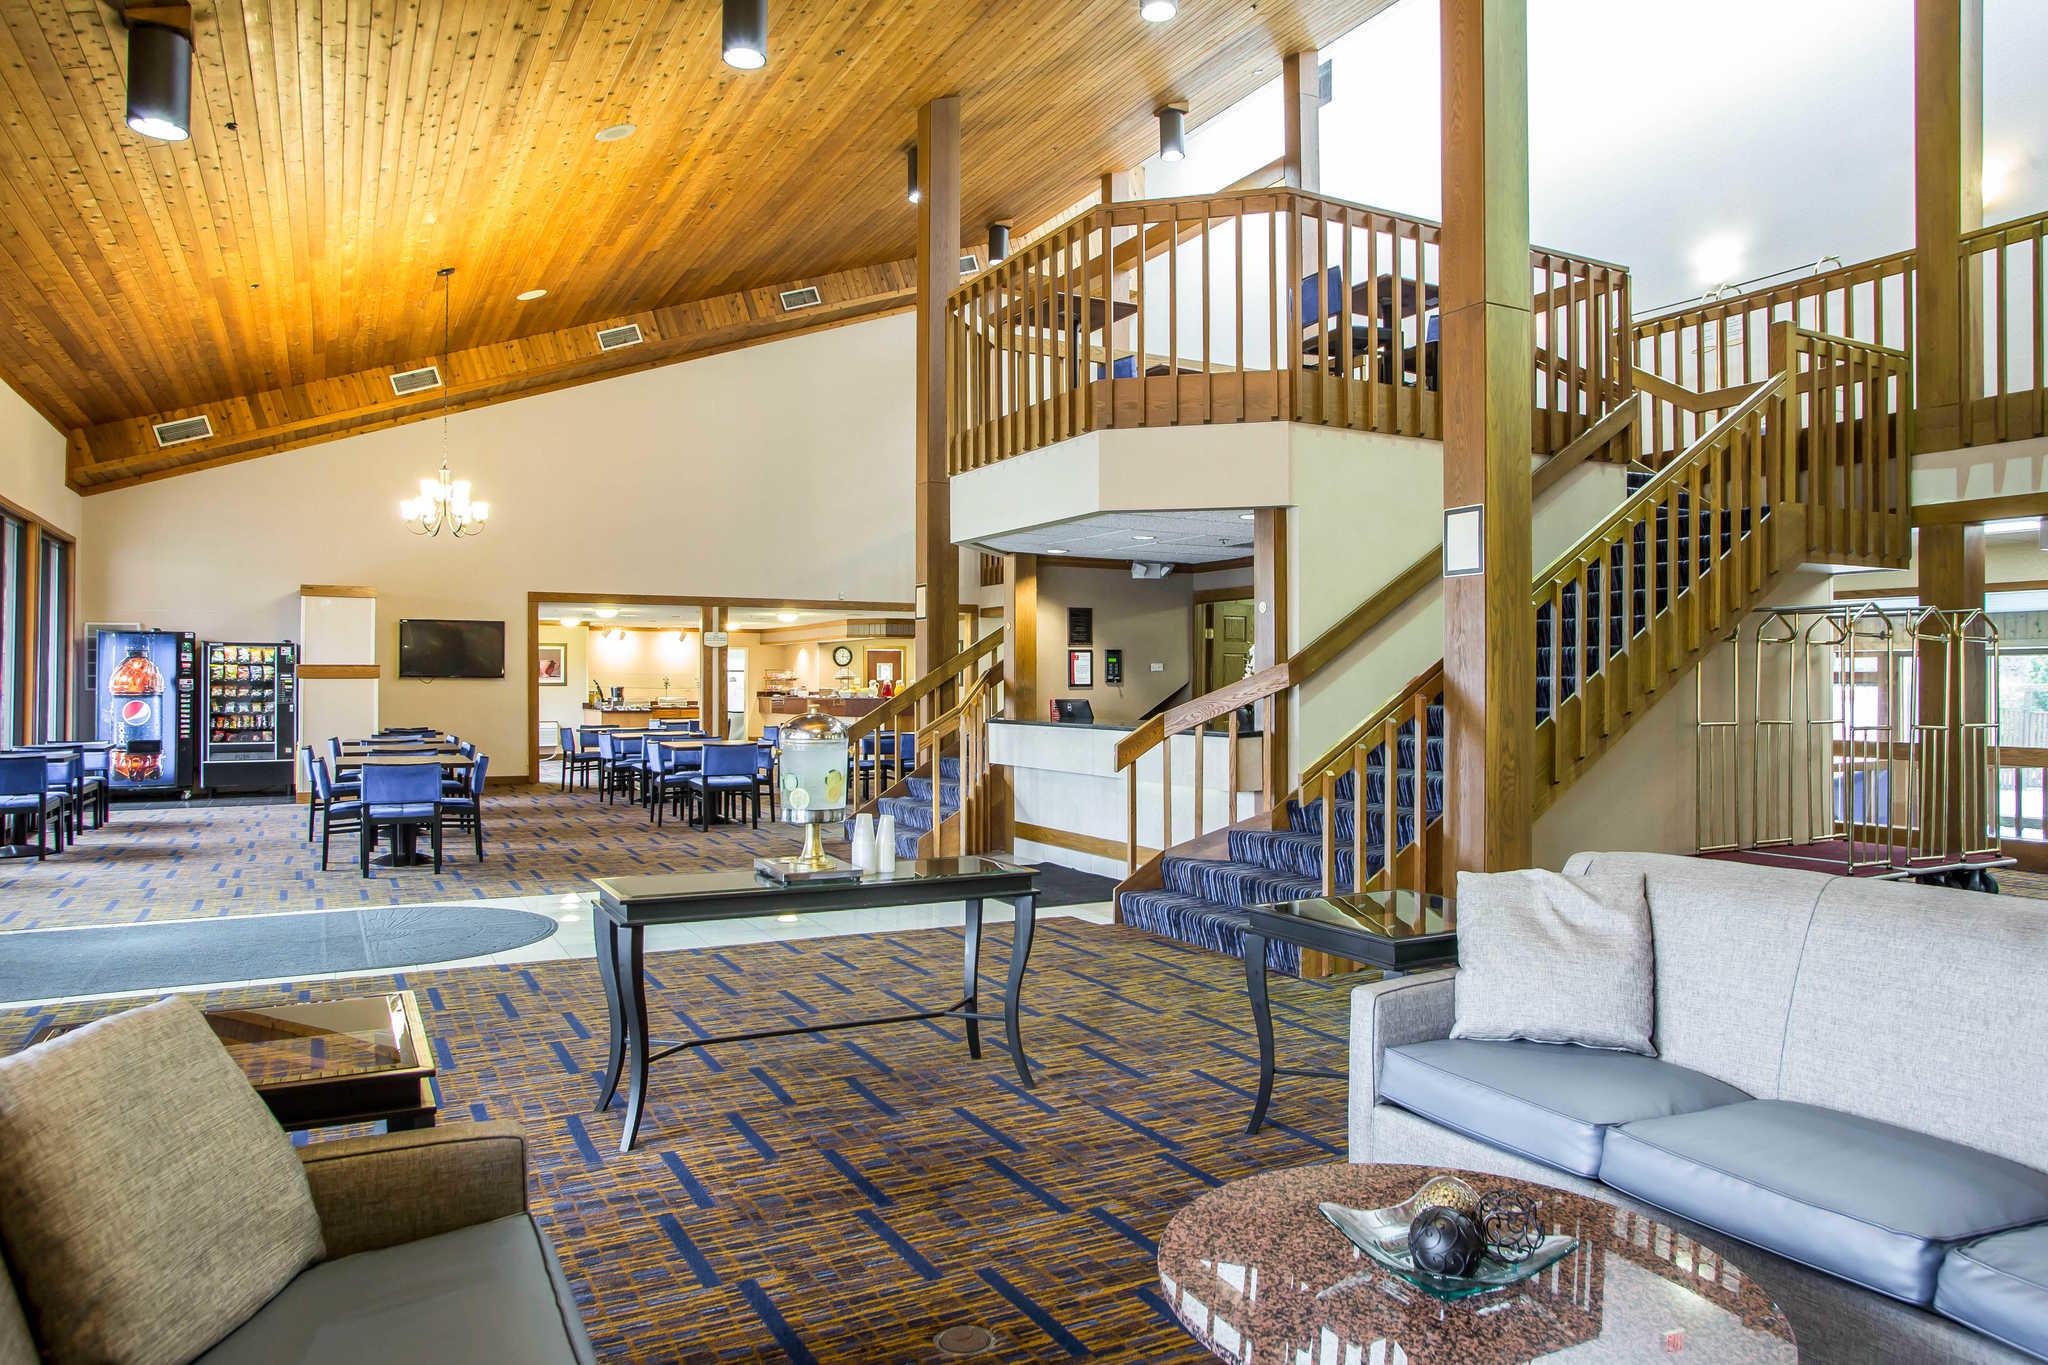 Clarion Inn image 5